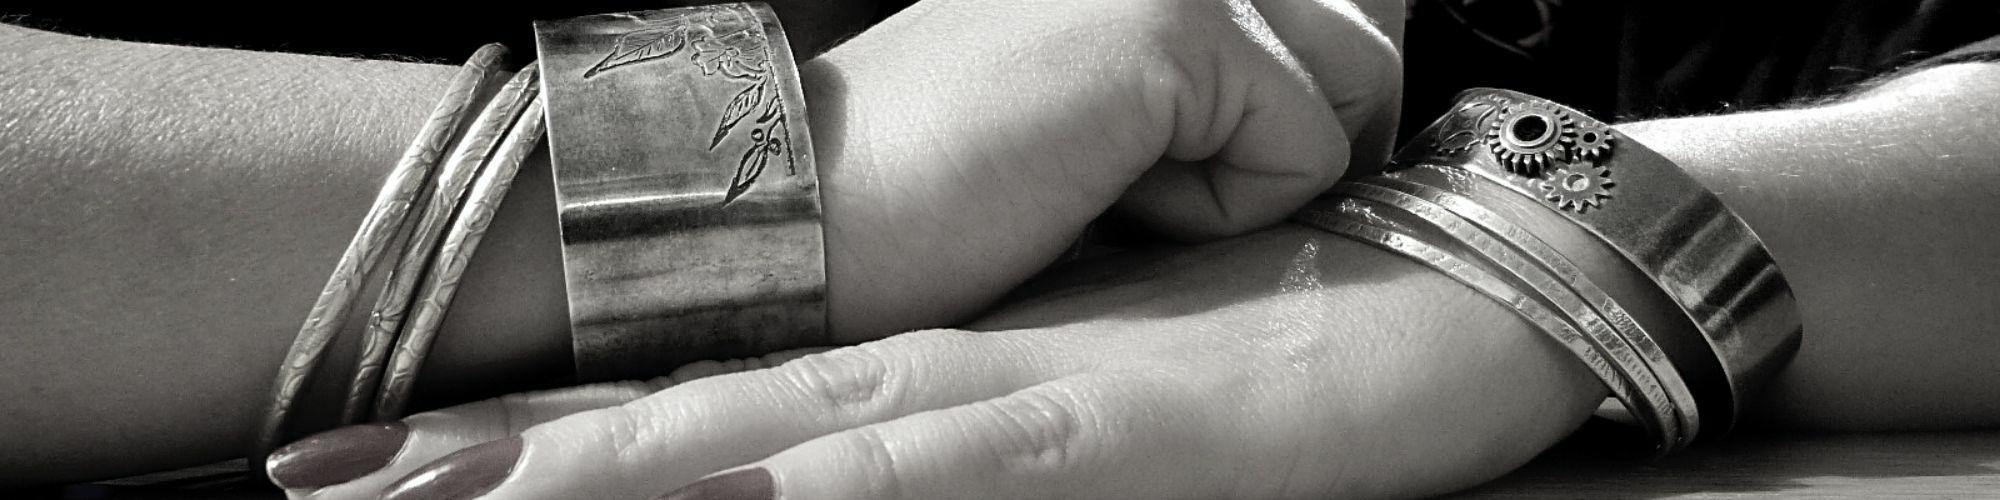 manchette gravée et bracelet engrenage - belladone bijoux